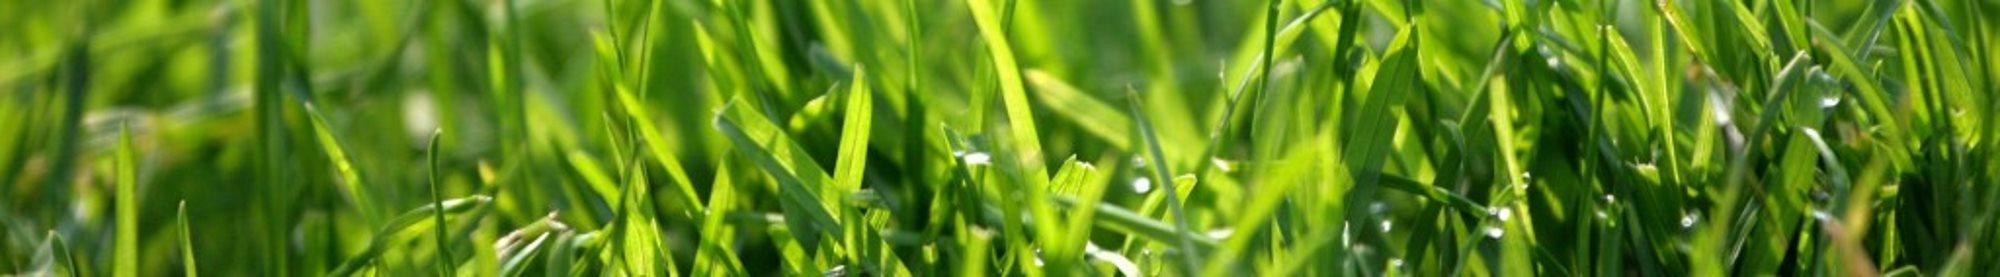 healthy-lawn-banner